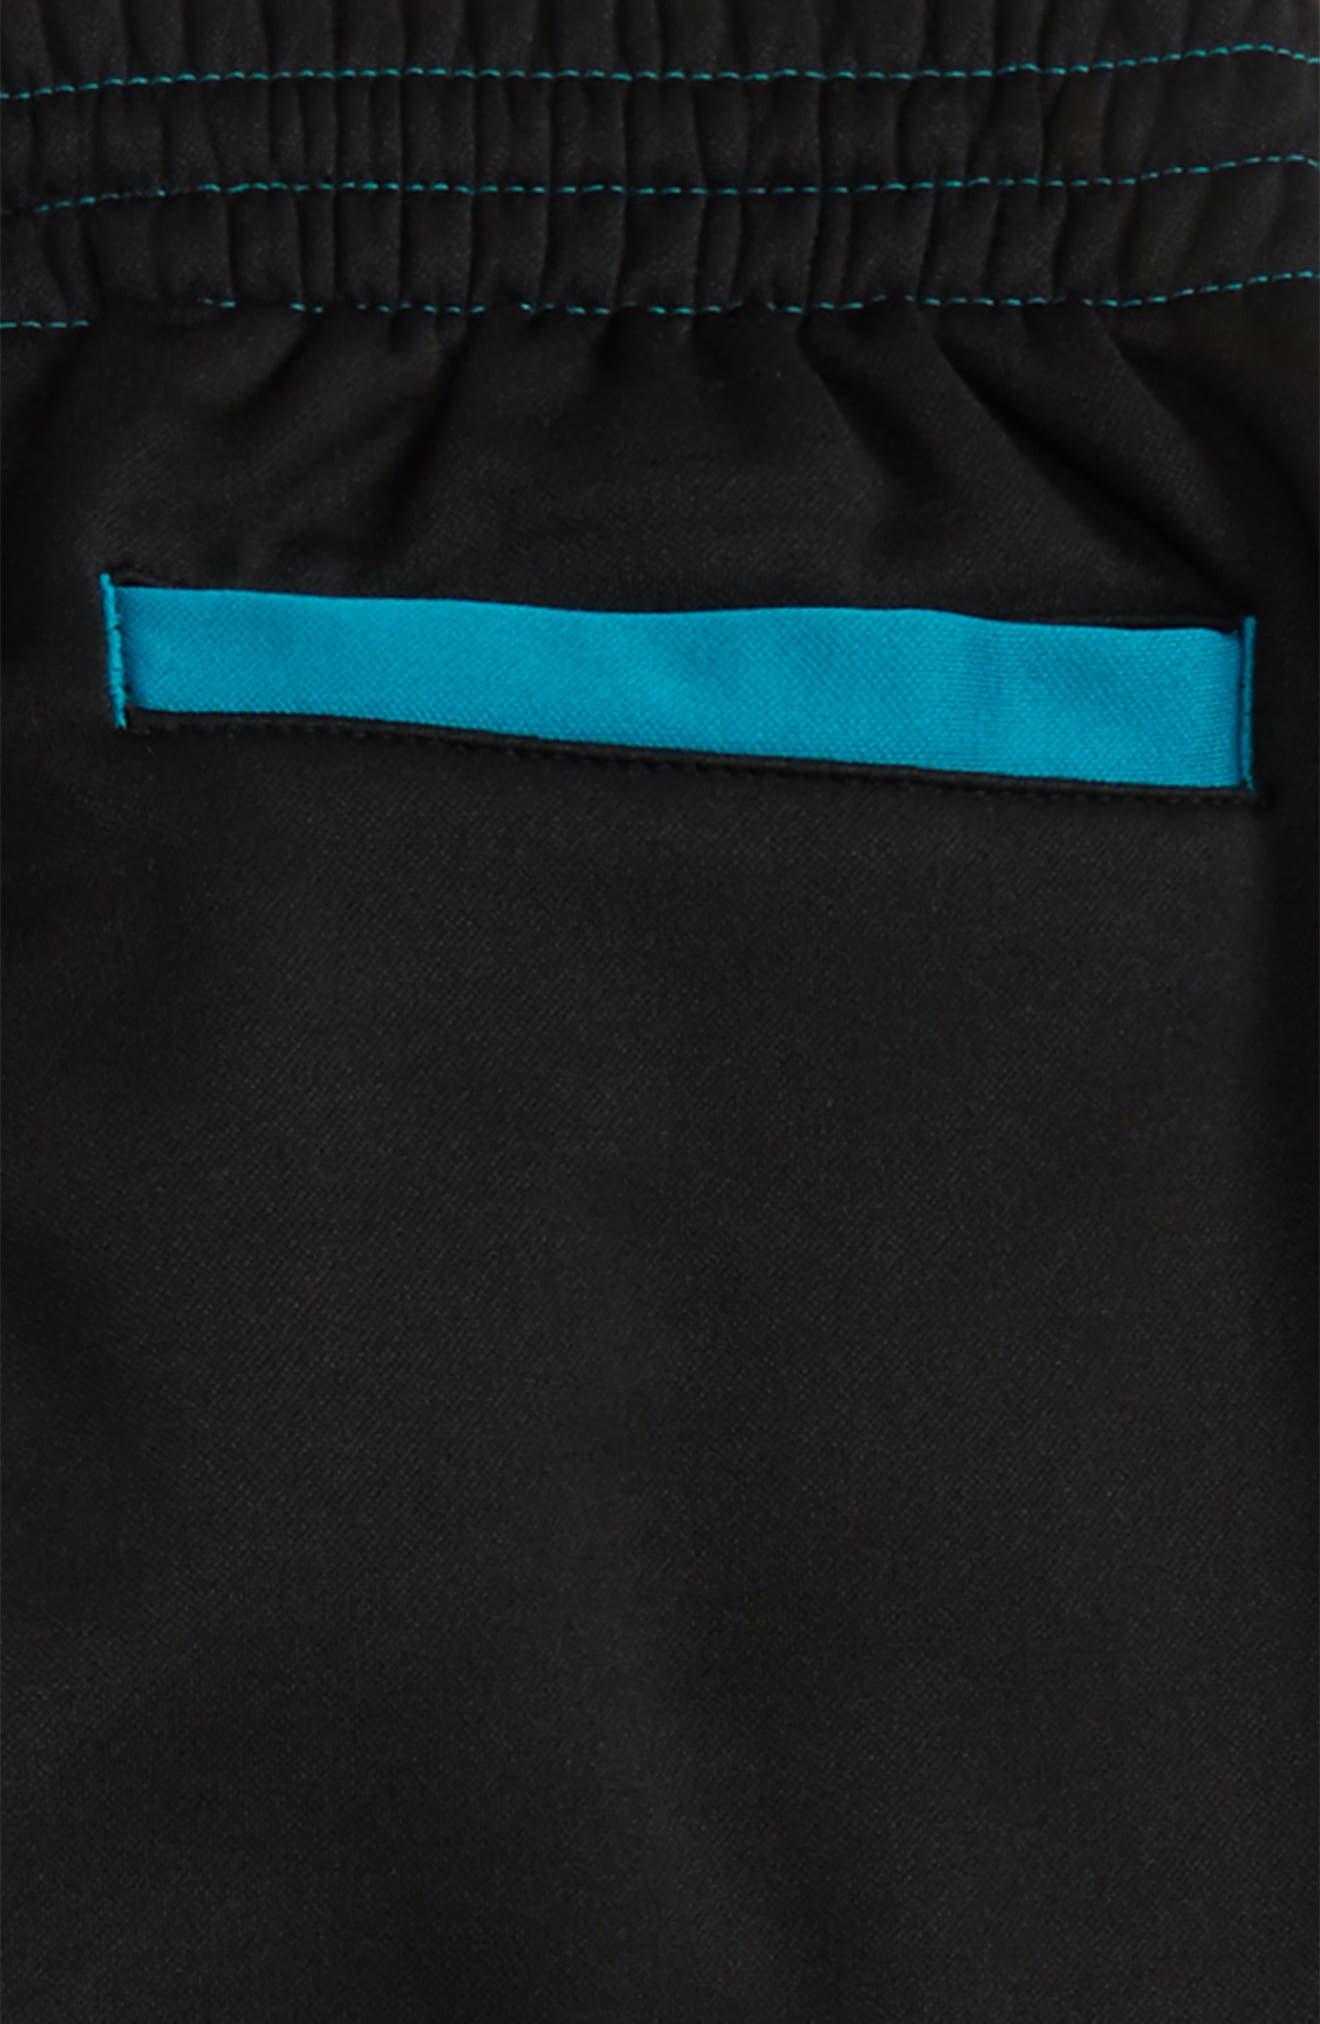 Jordan Flight Air Therma-FIT Reversible Fleece Pants,                             Alternate thumbnail 3, color,                             441